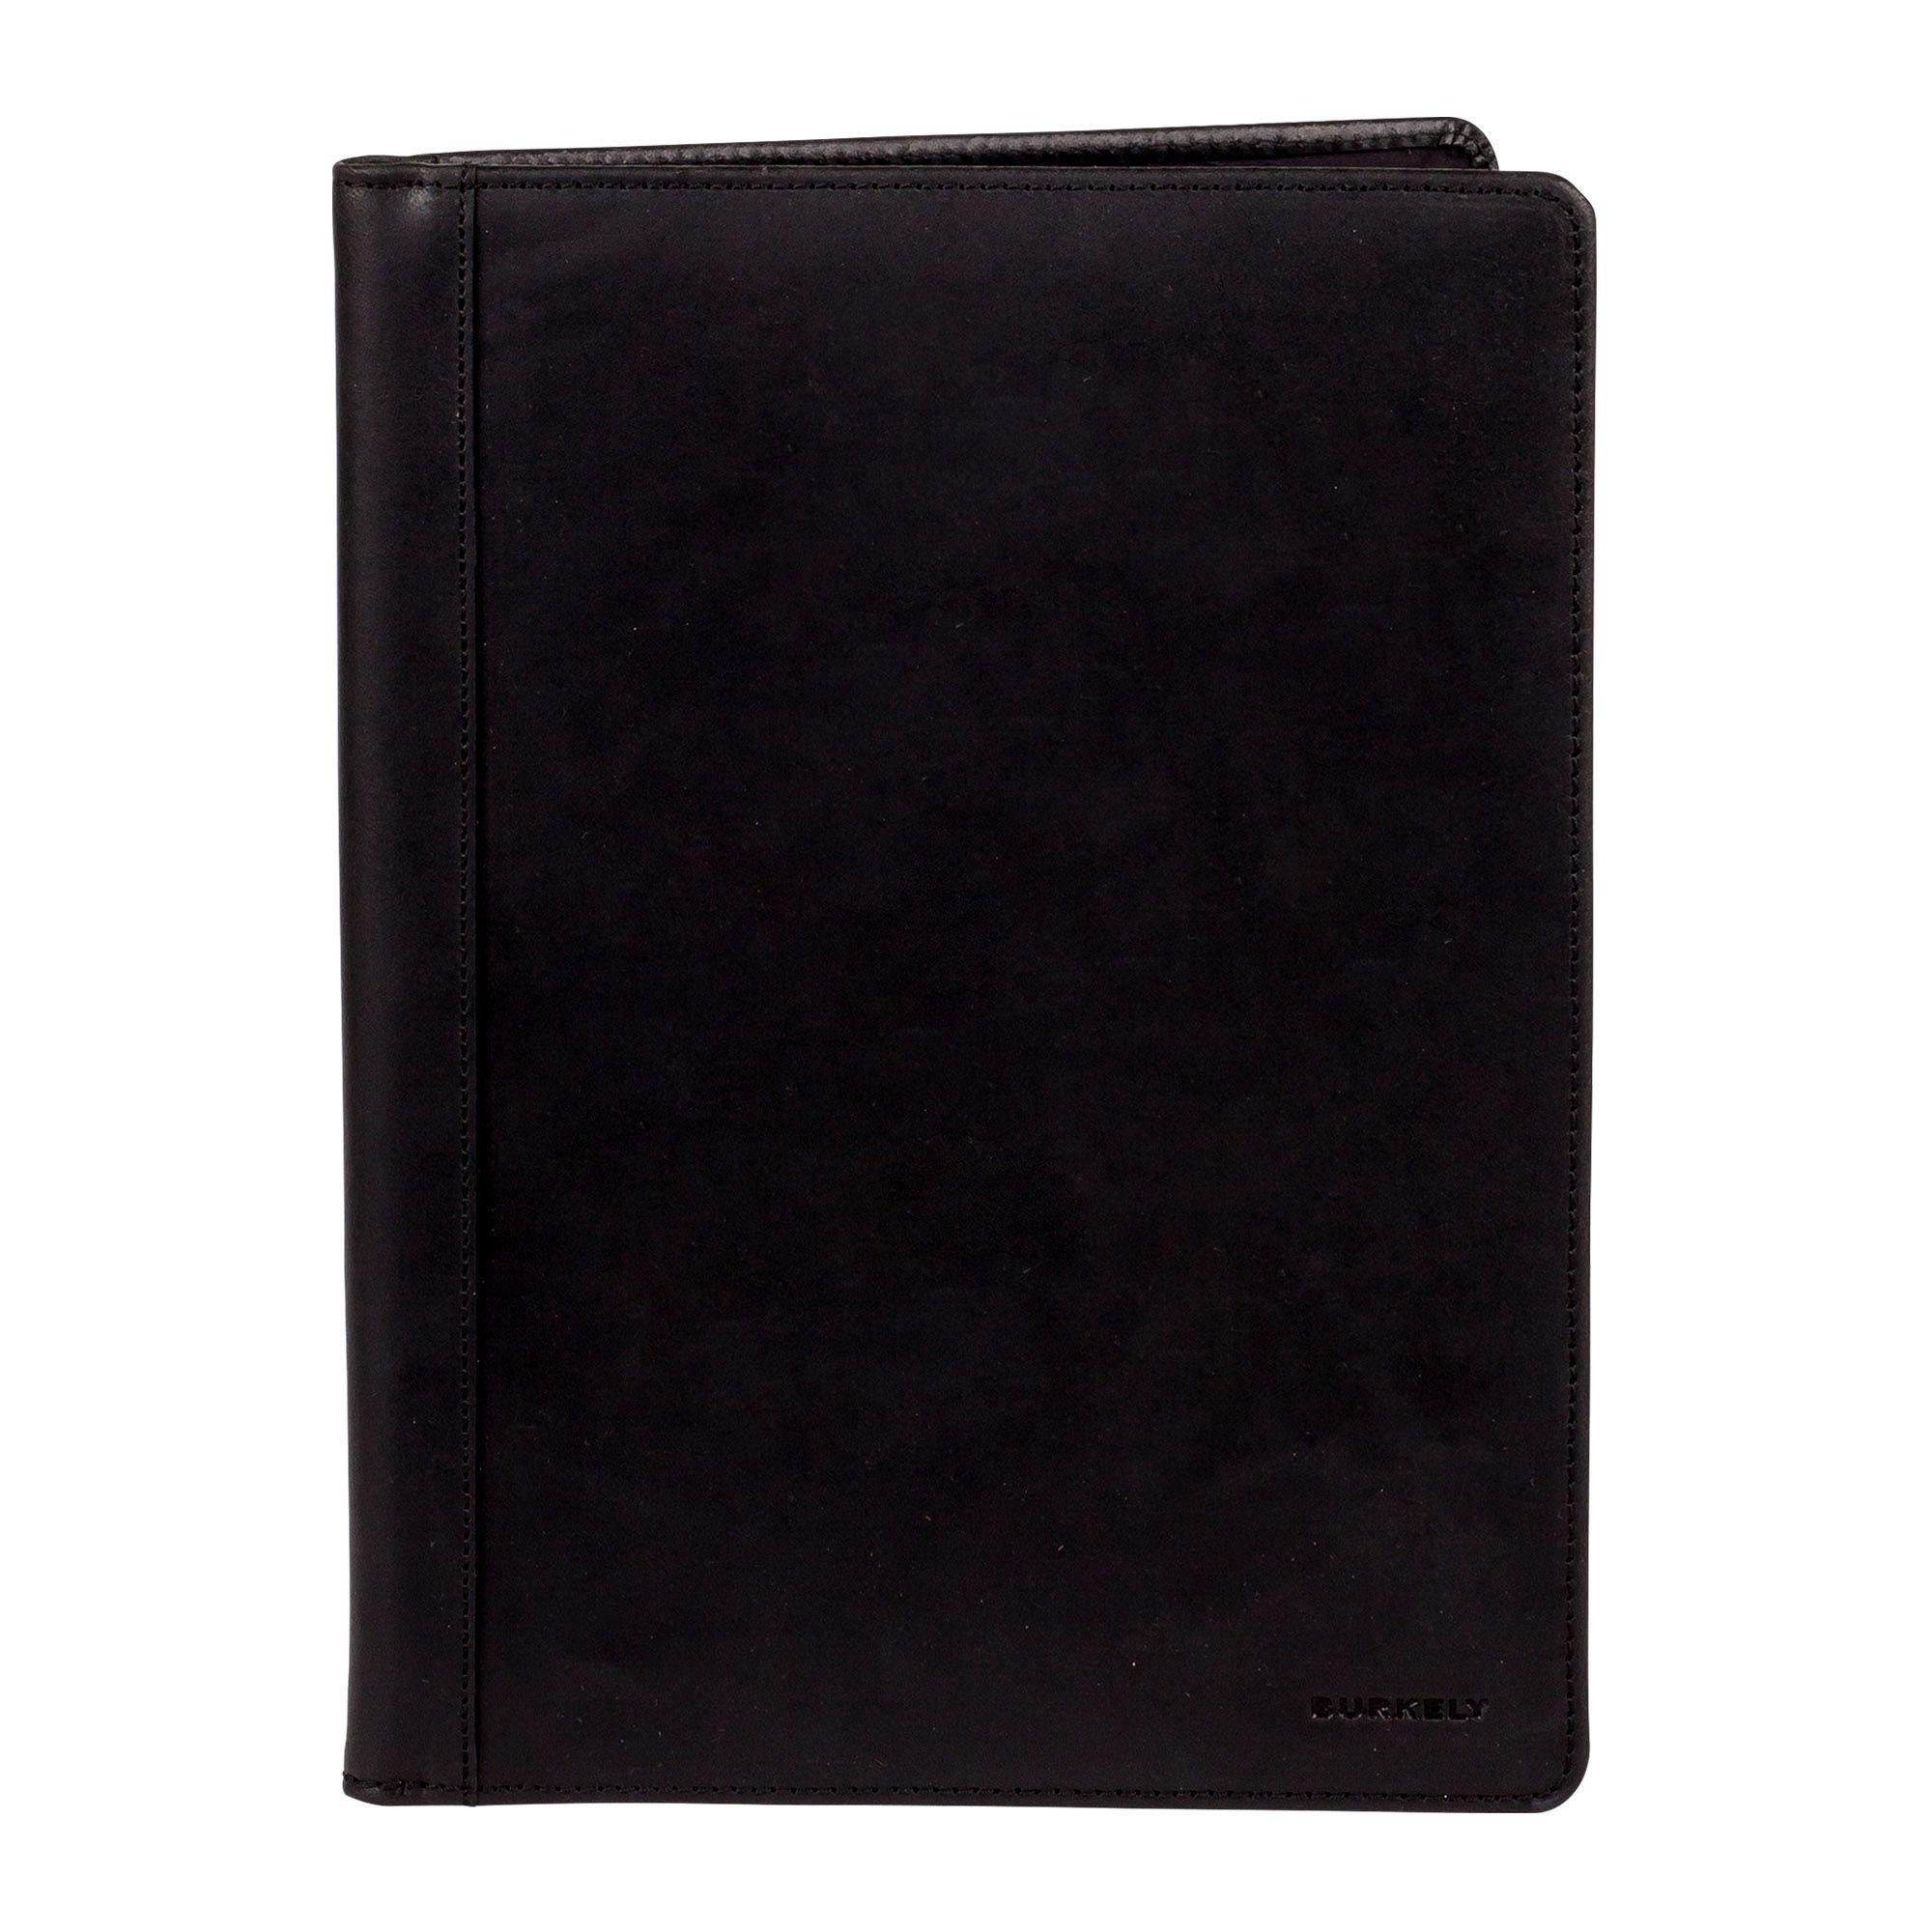 Bing Burkely Cru A4 Filecover Noir ugihaXu